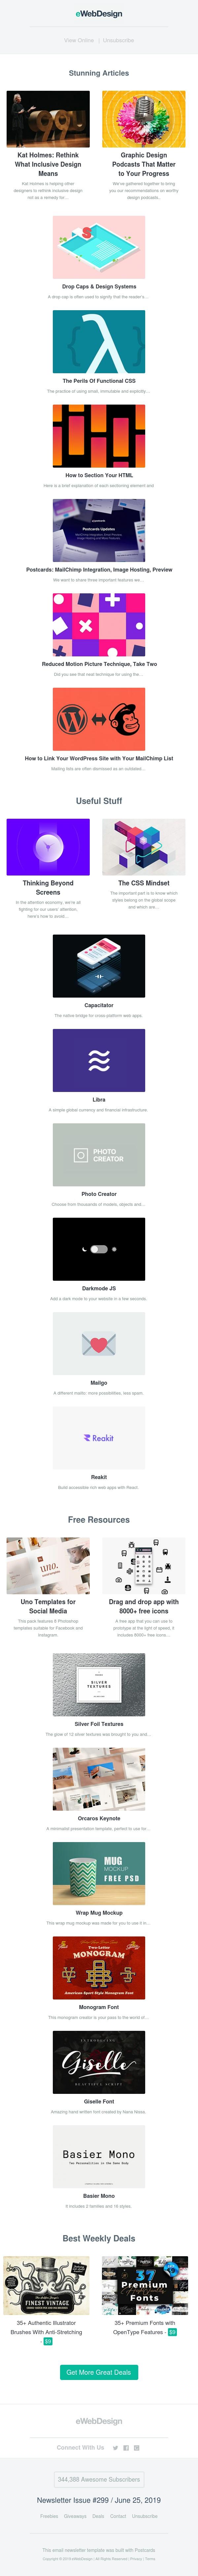 Inclusive Design, Graphic Design Podcasts, Functional CSS, Orcaros Keynote, Libra, Photo Creator, Darkmode JS, Mailgo